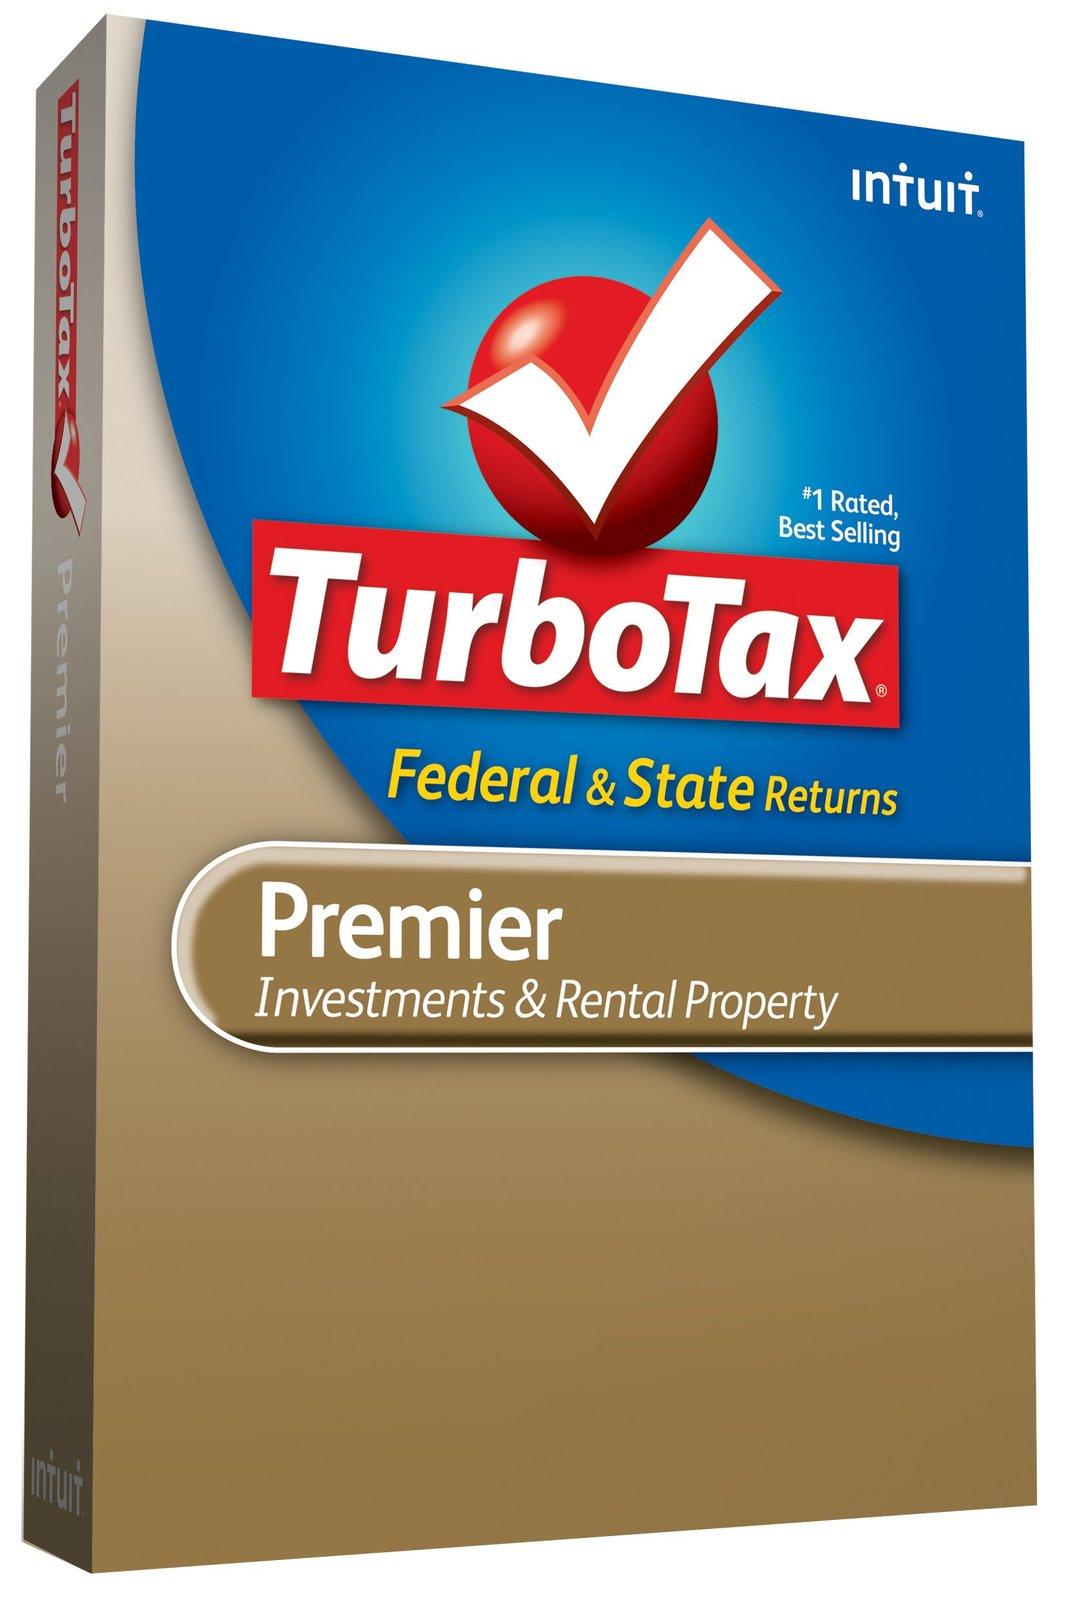 TurboTax Premier Federal + State + Federal efile 2009 [CD-ROM] Windows 7 / Wi...